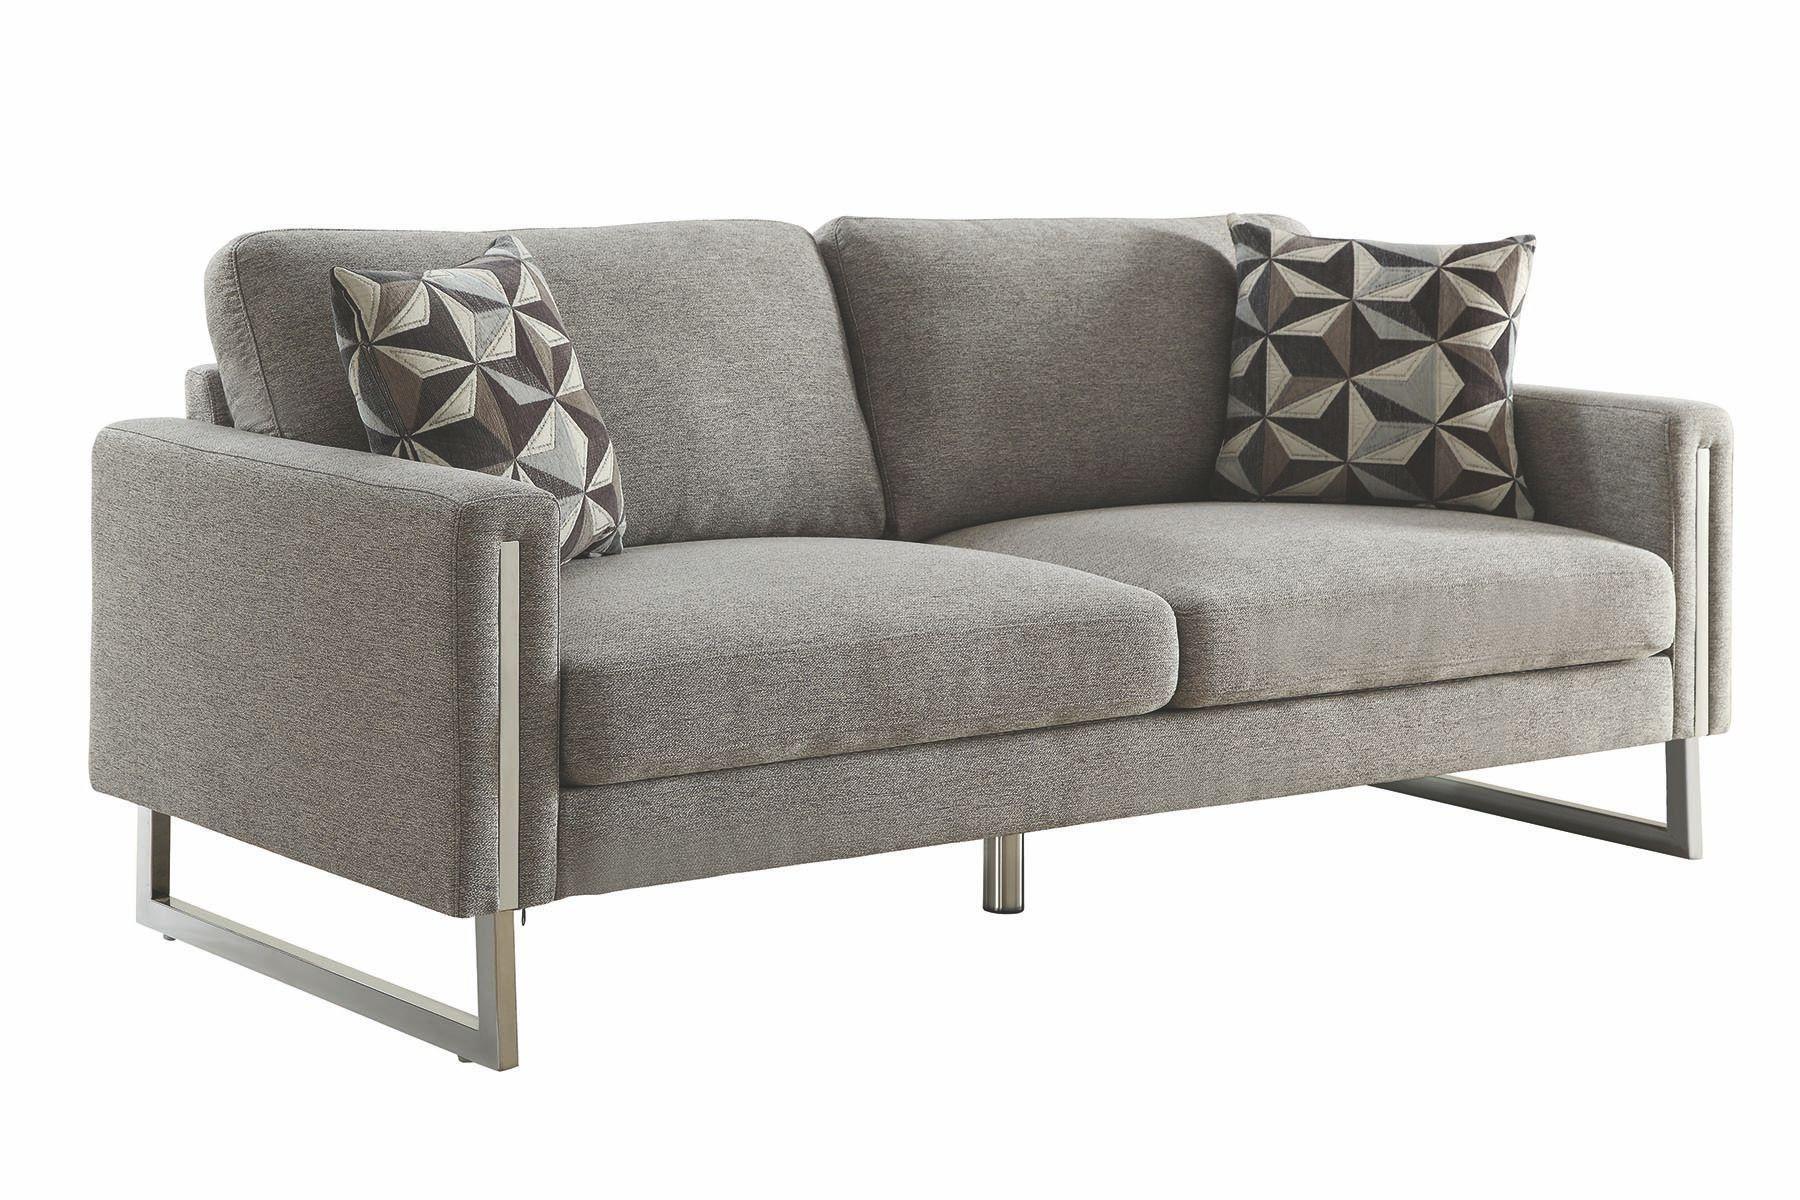 One In Stock Meta Chrome Leg Grey Sofa 77 W X 35 H X 34 D Rent 72 Buy 499 Black Fabric Sofa Upholstered Sofa Sofa